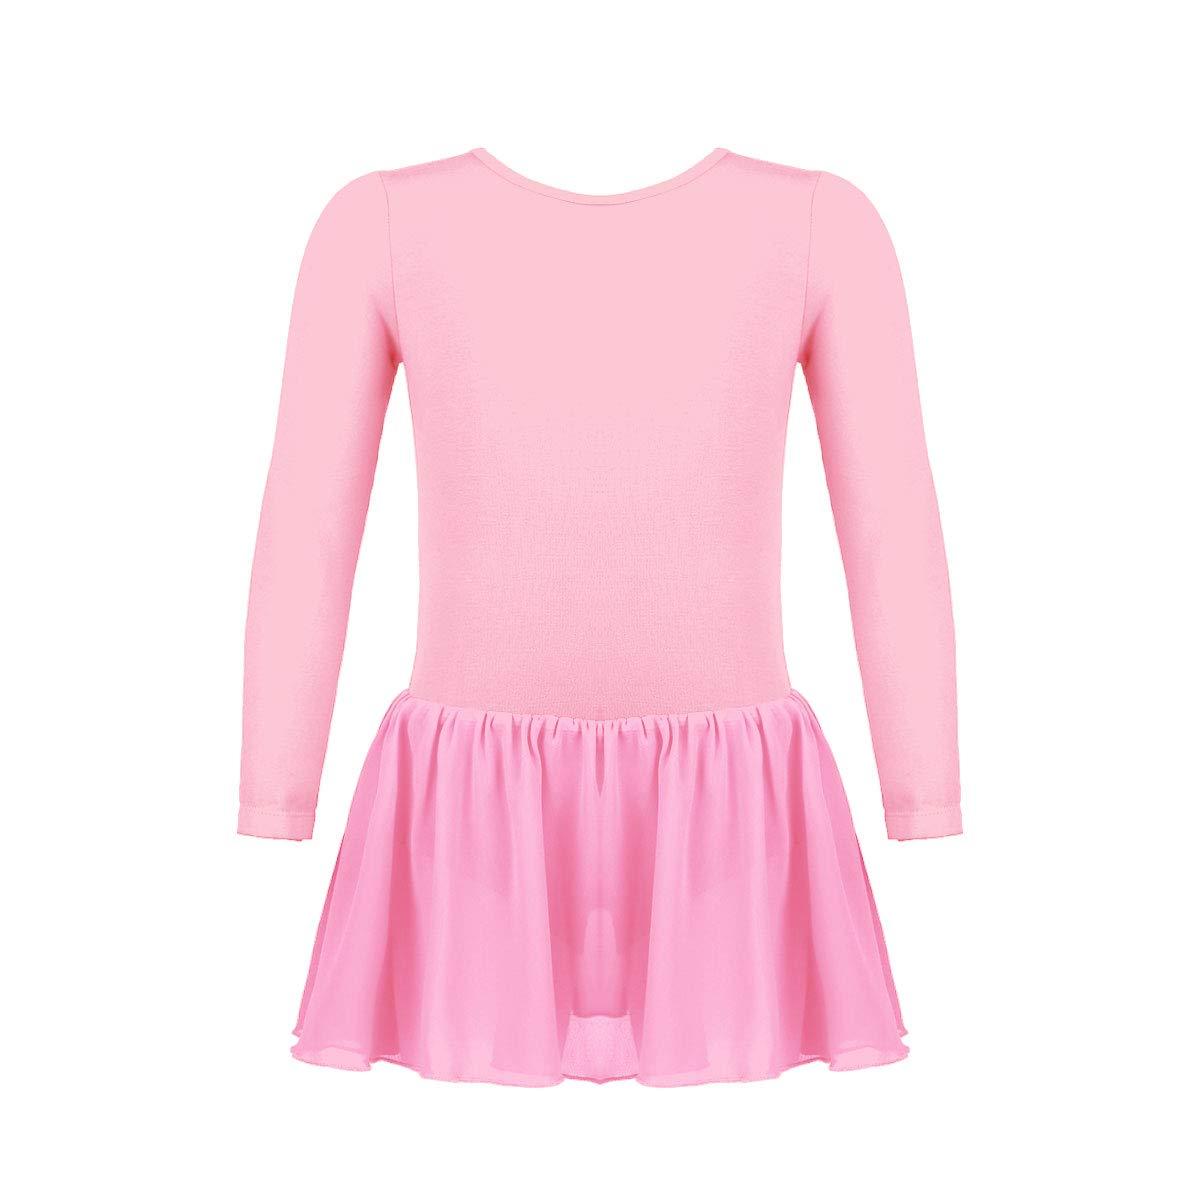 Freebily Little Big Girls Classic Long Sleeve Leotard with Chiffon Skirt Ballet Tutu Gymnastics Dance Dress